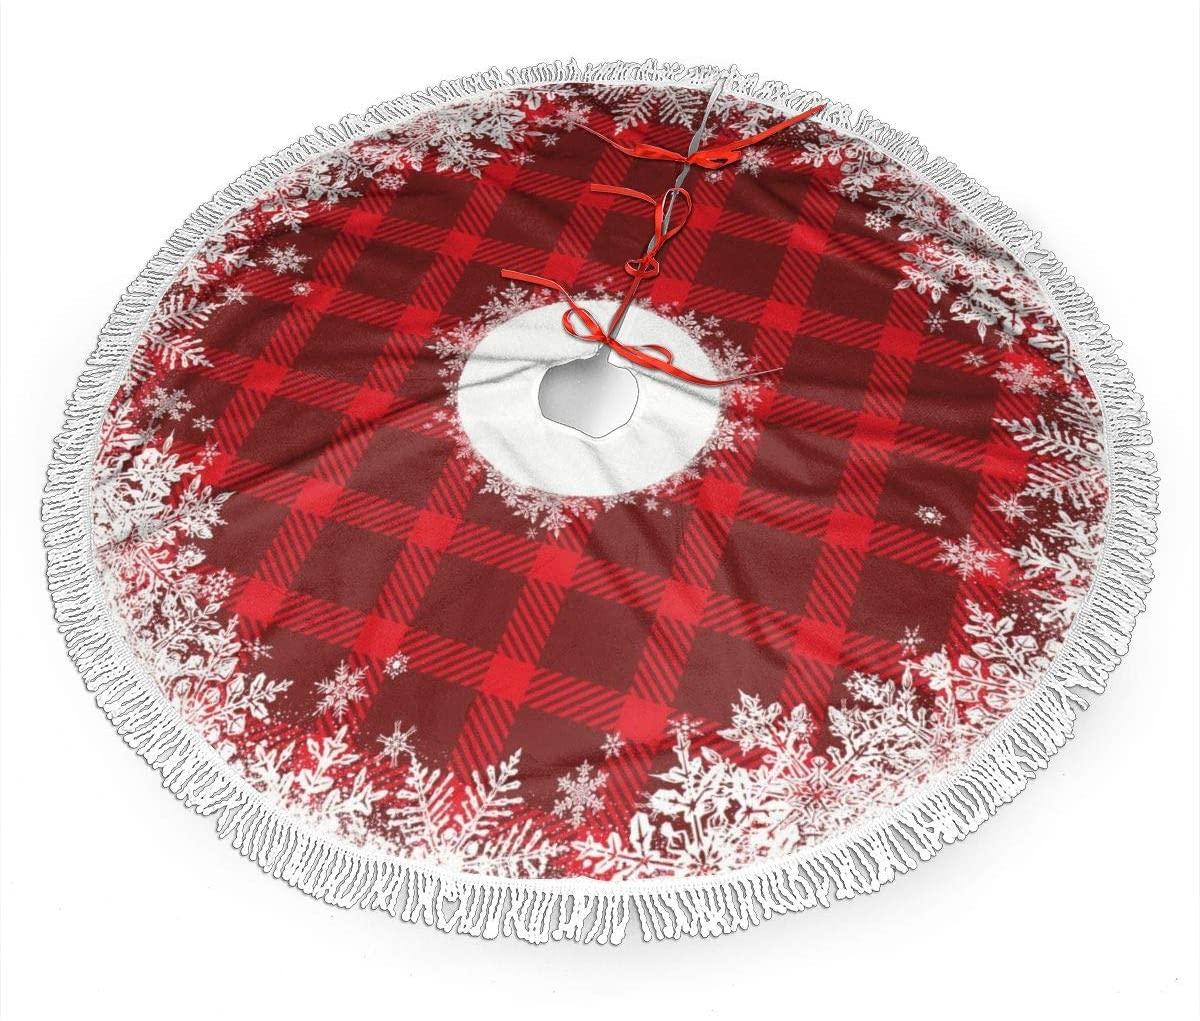 ASO-SLING Soft Merry Christmas Tree Skirt with Tassel Rustic Tartan Plaid Snowflake Thick Tree Decor Carpet Xmas Holiday Party Ornaments Holiday Christmas Tree Decoration